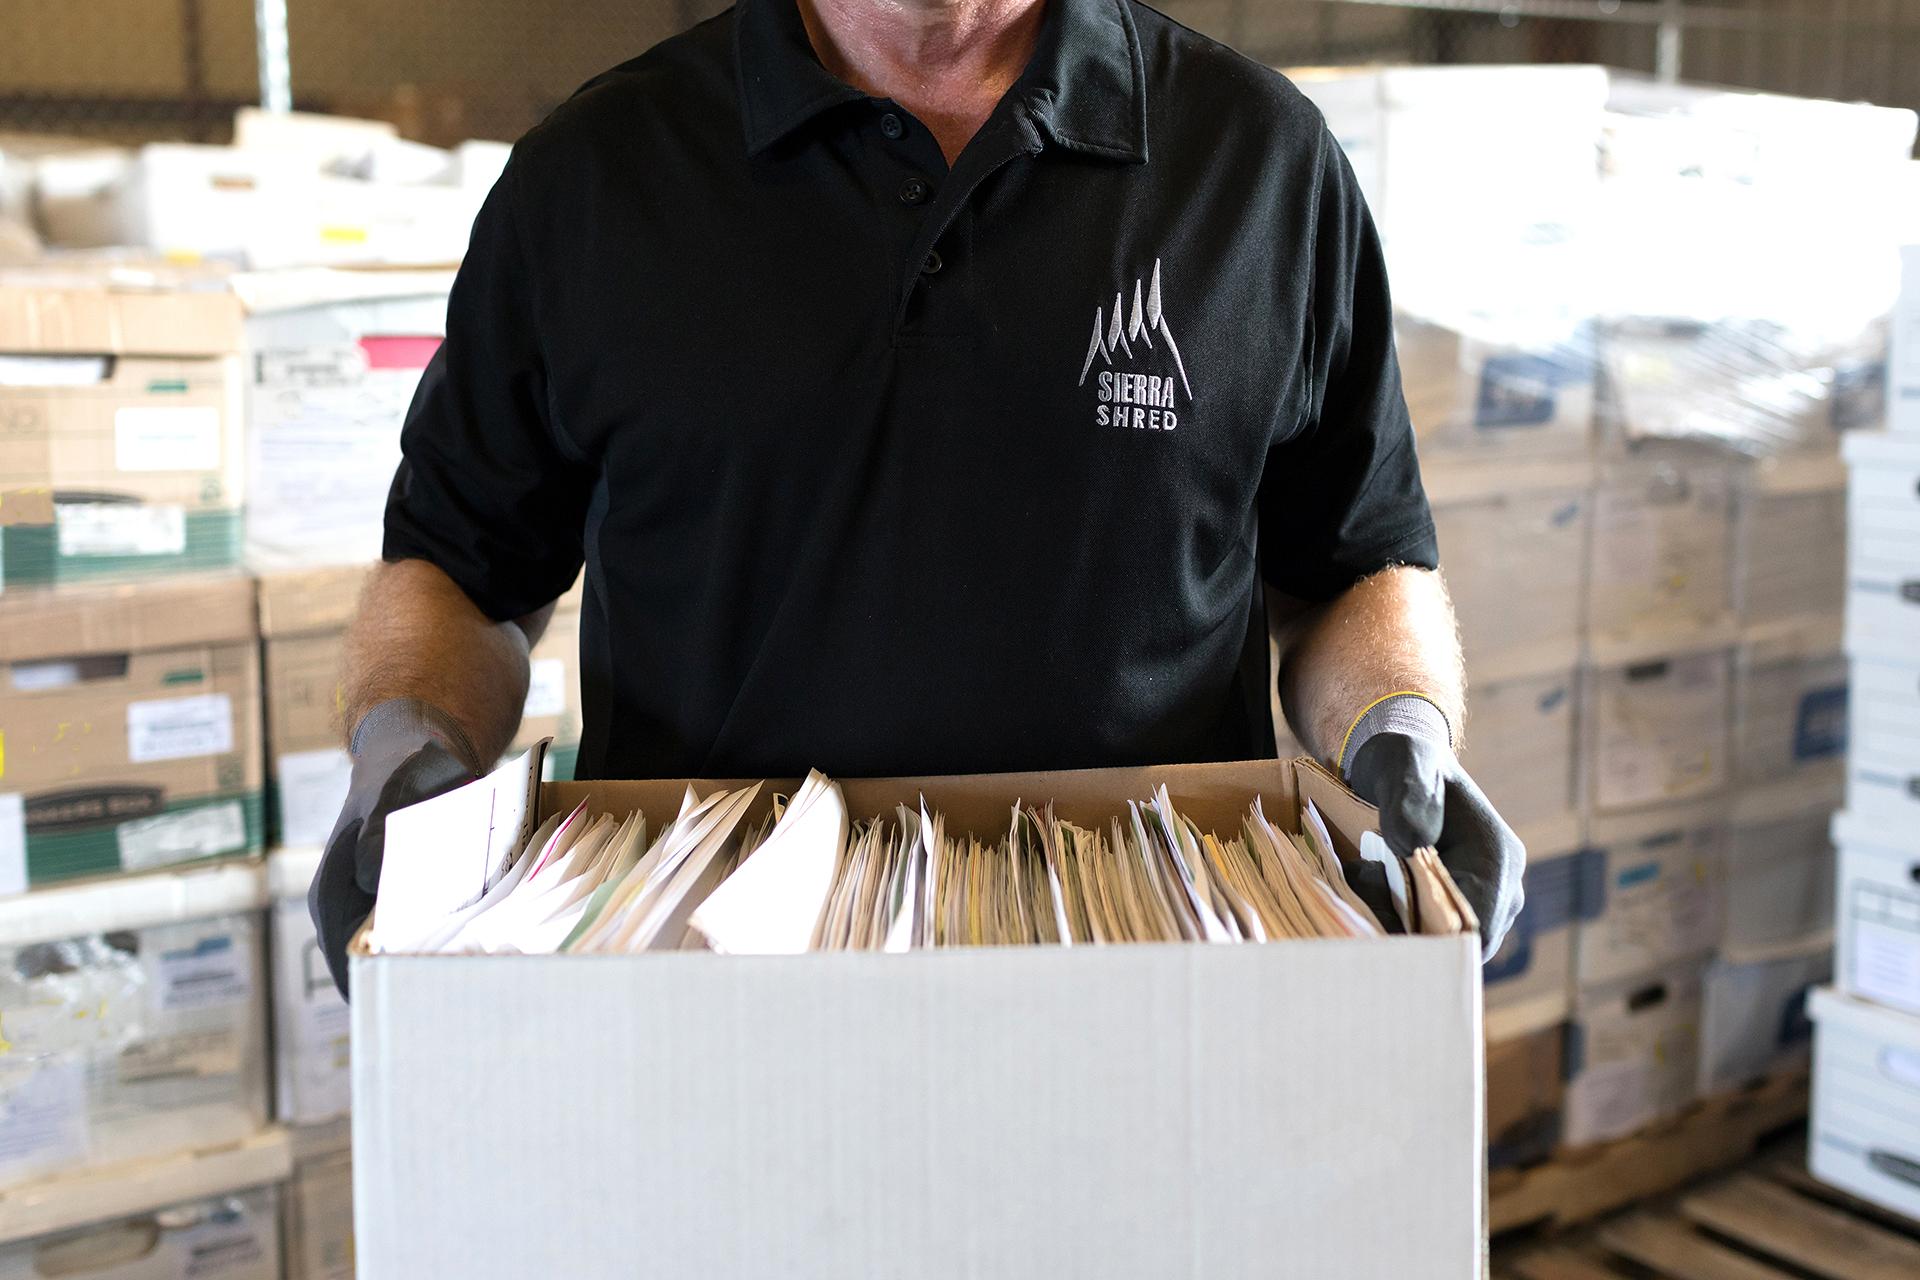 Coppell, TX Shredding Service